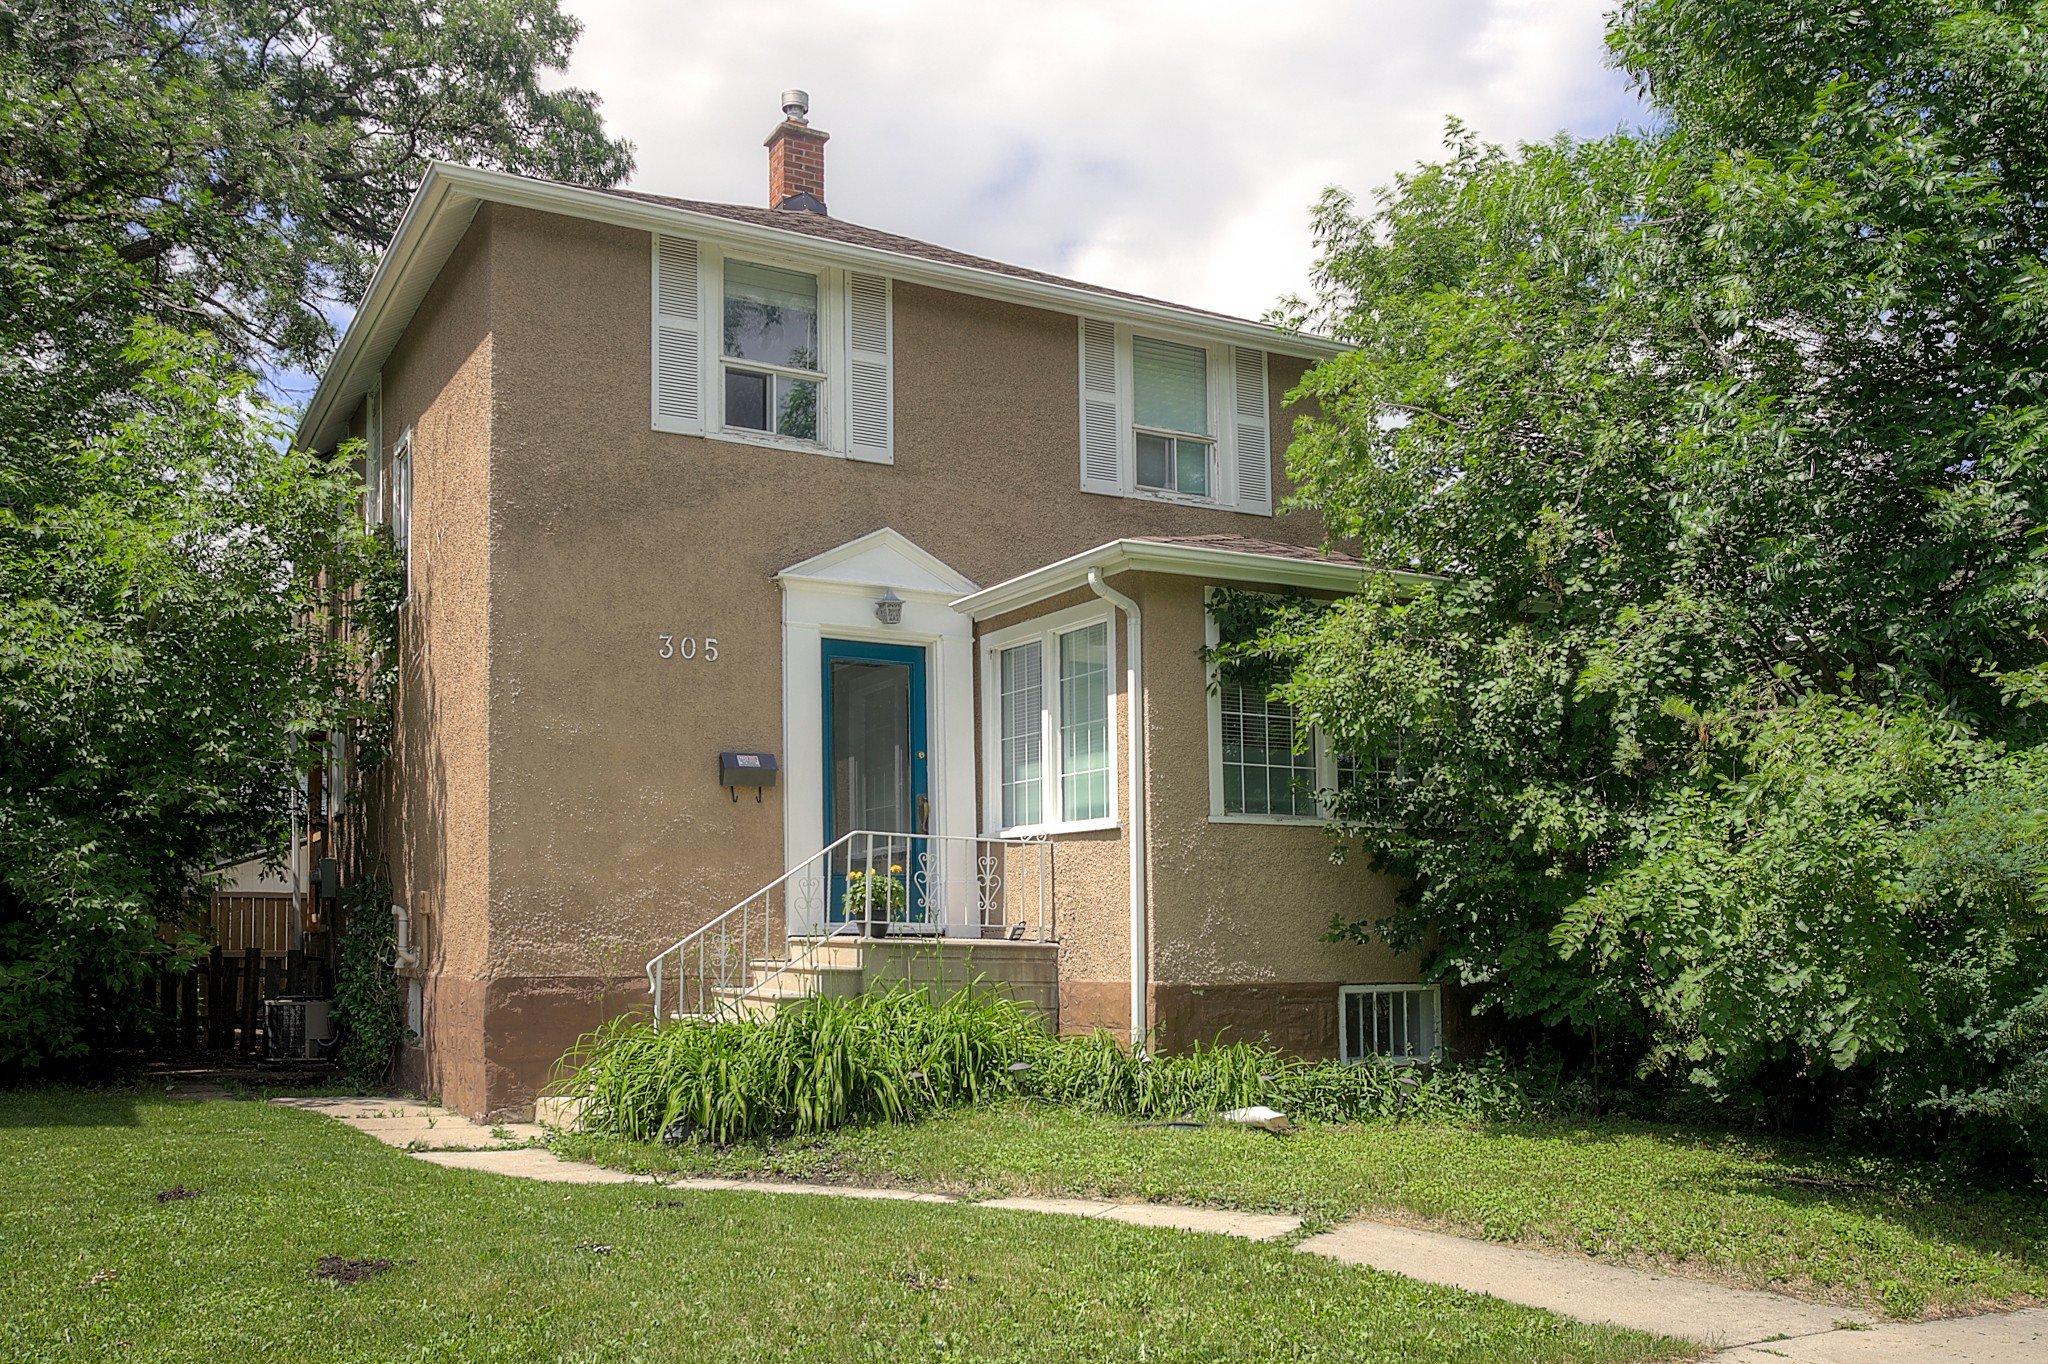 Main Photo: 305 Beaverbrook Street in Winnipeg: Single Family Detached for sale (1C)  : MLS®# 202015362